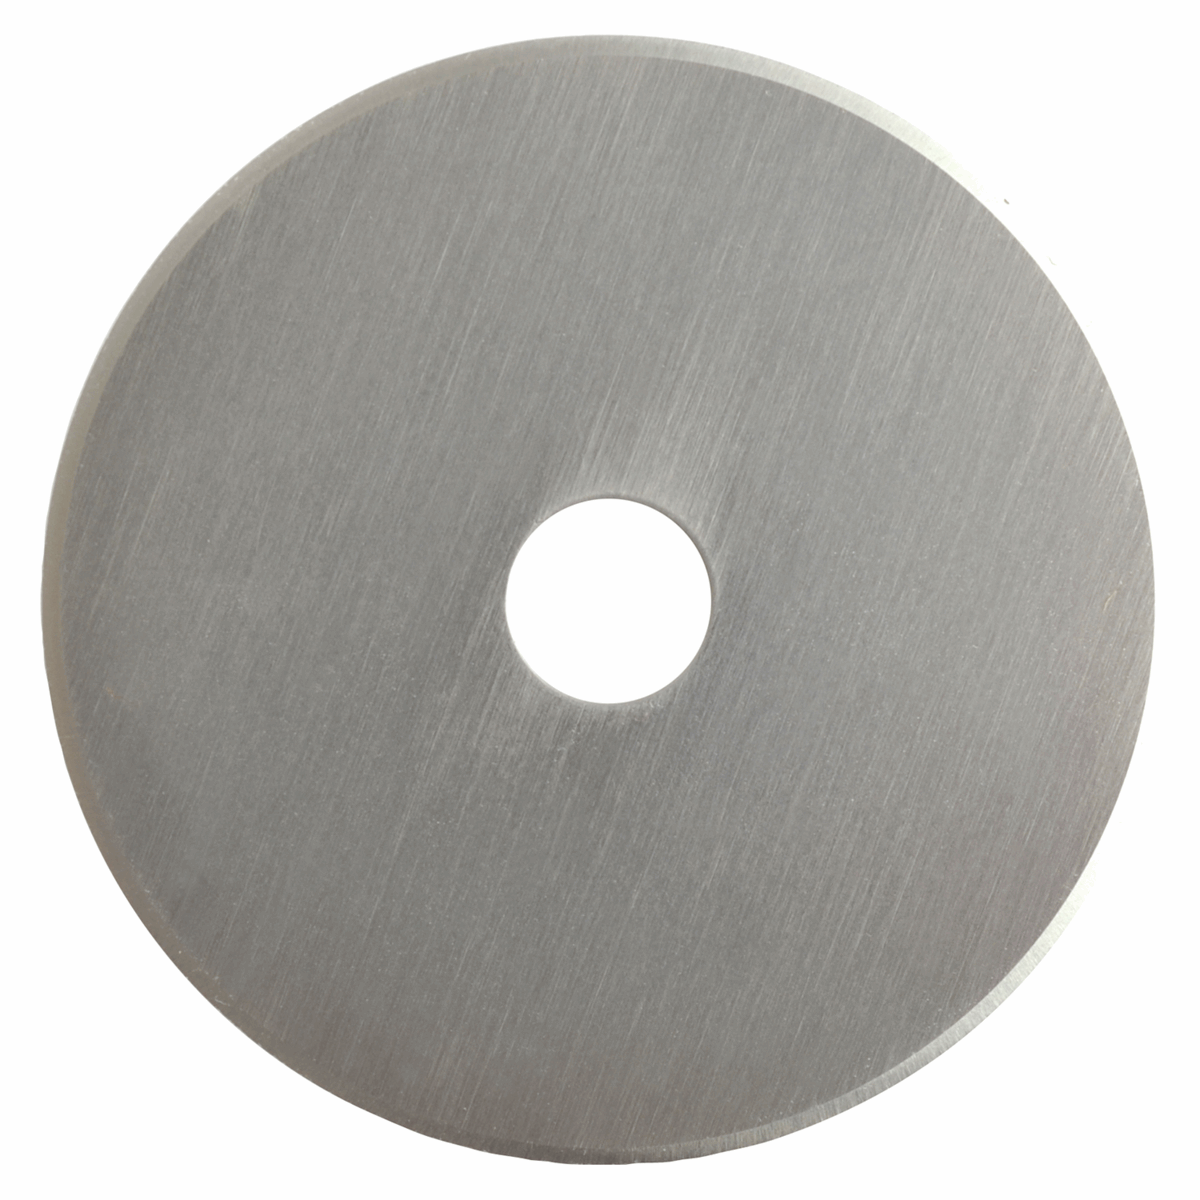 Fiskars Rotary Blade: Straight Cutting: 45mm